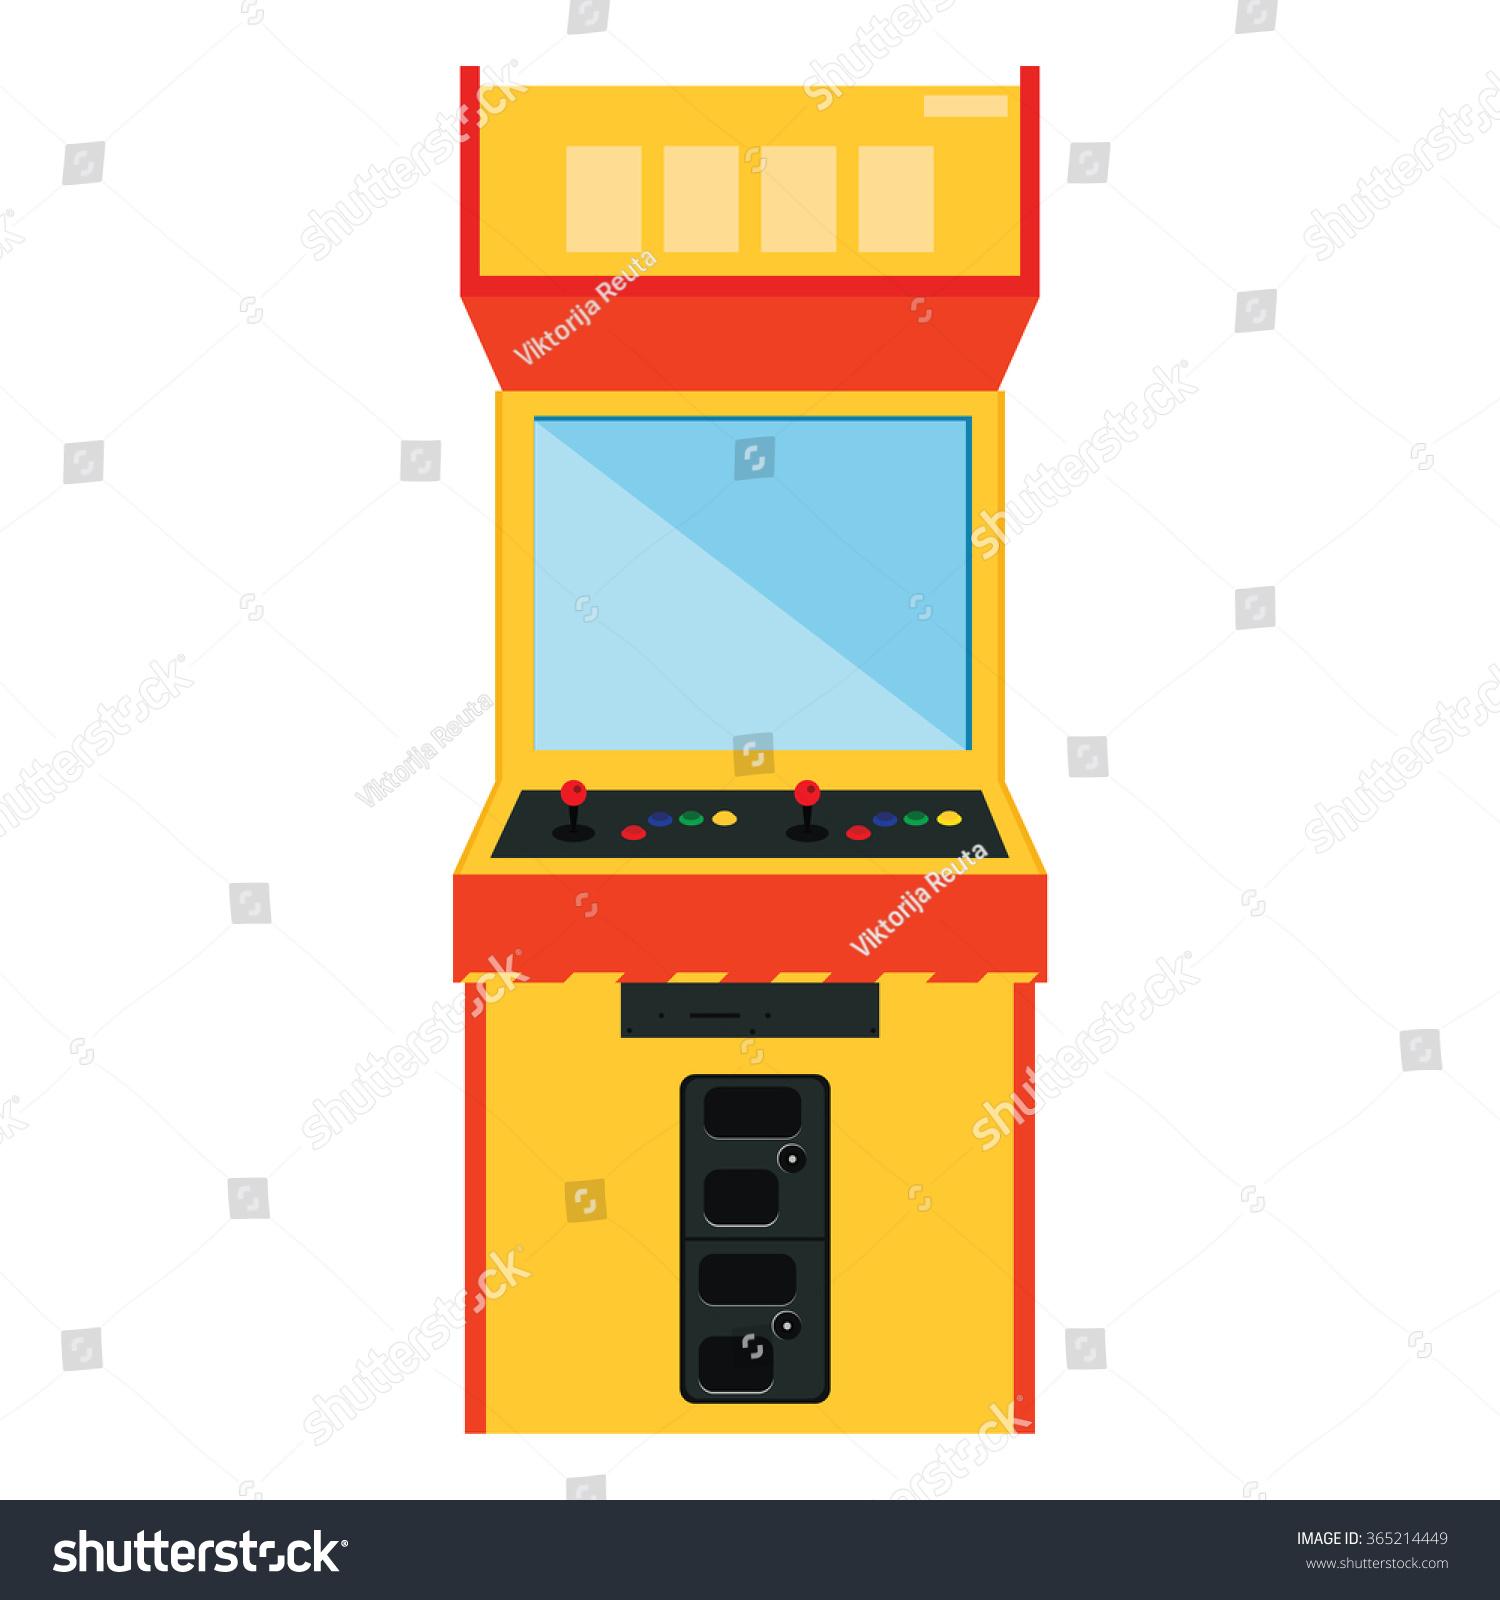 Vector Illustration Retro Arcade Game Machine Stock Vector ...